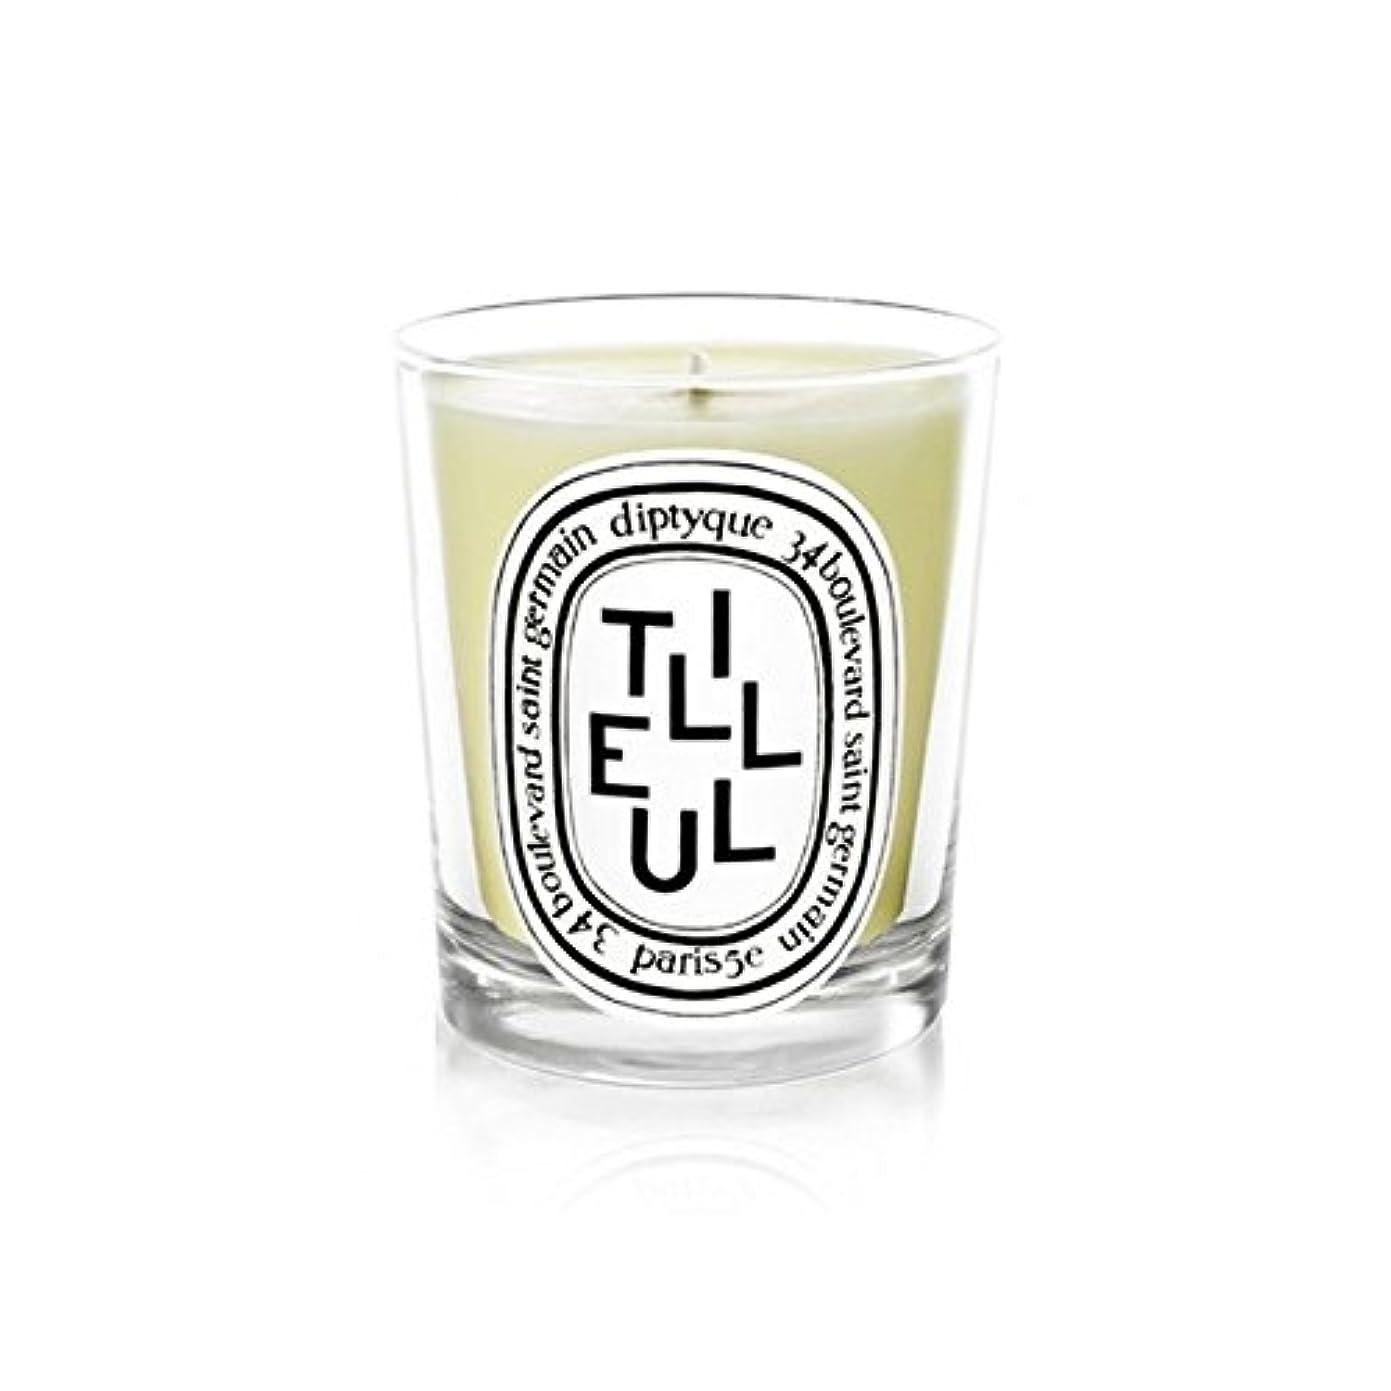 Diptyque Candle Tilleul / Linden Tree 190g (Pack of 2) - DiptyqueキャンドルTilleulの/菩提樹の190グラム (x2) [並行輸入品]